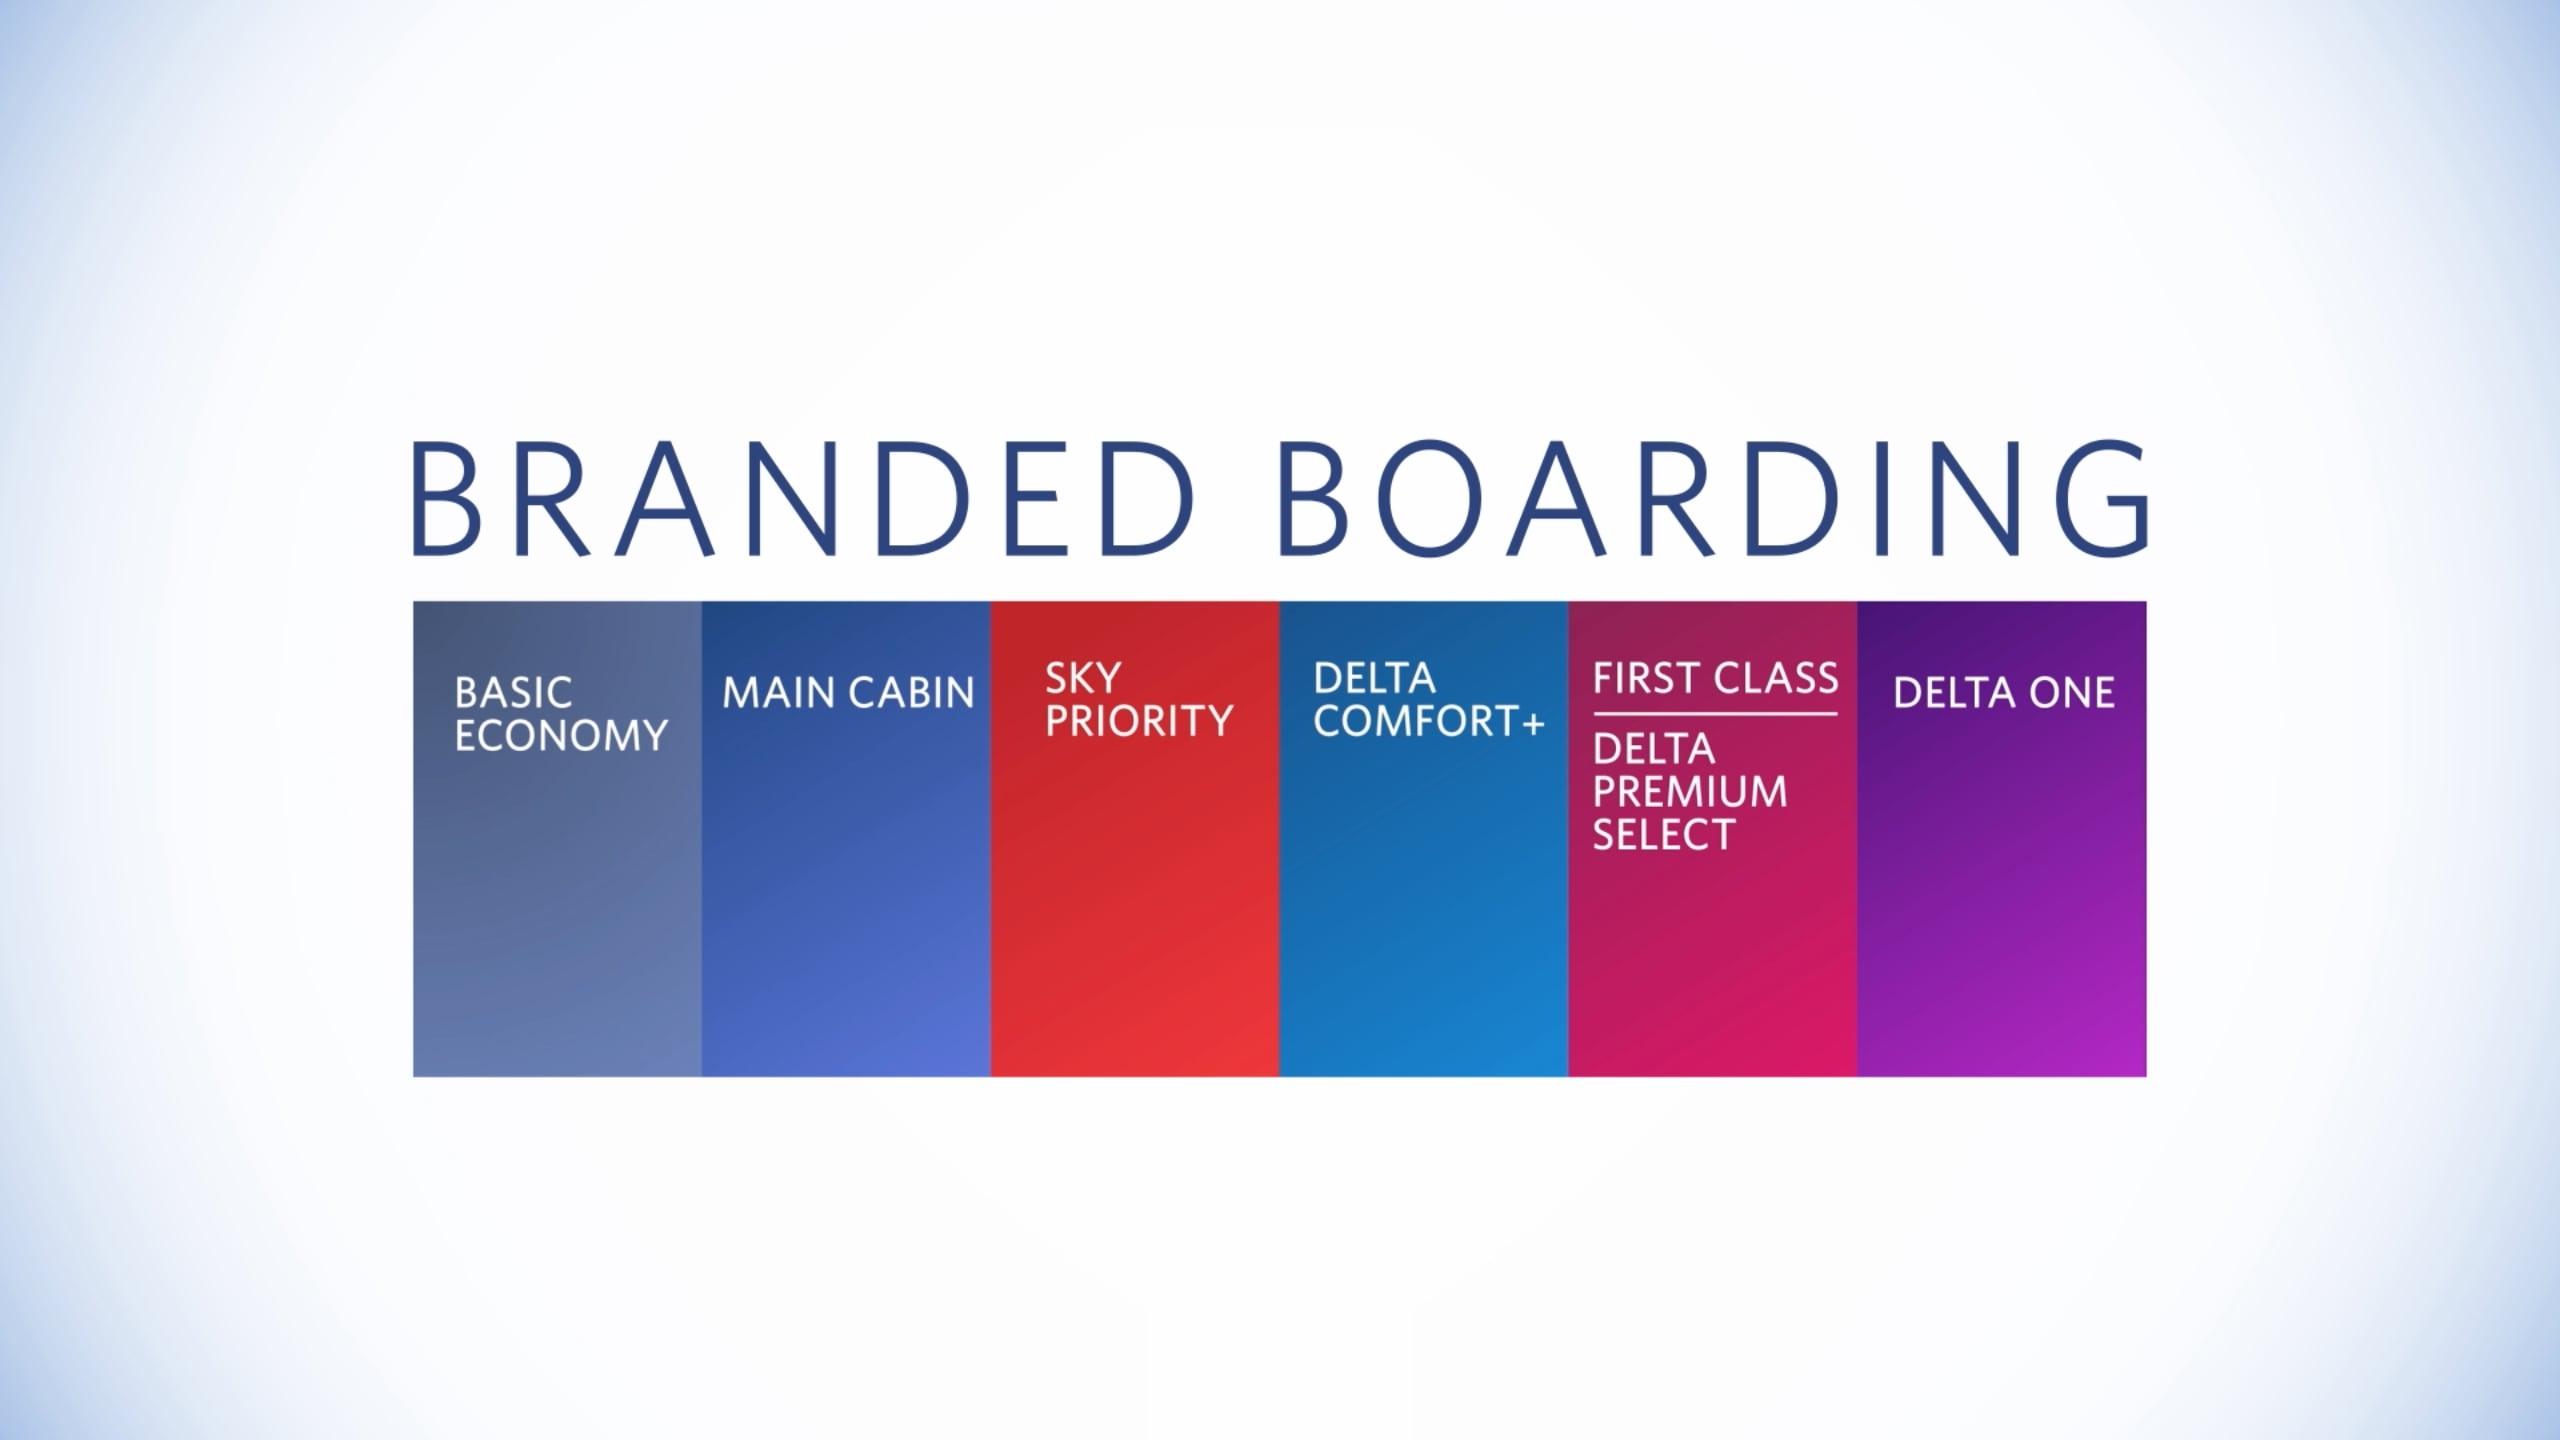 Boarding simplified: Delta extends branded fares to boarding